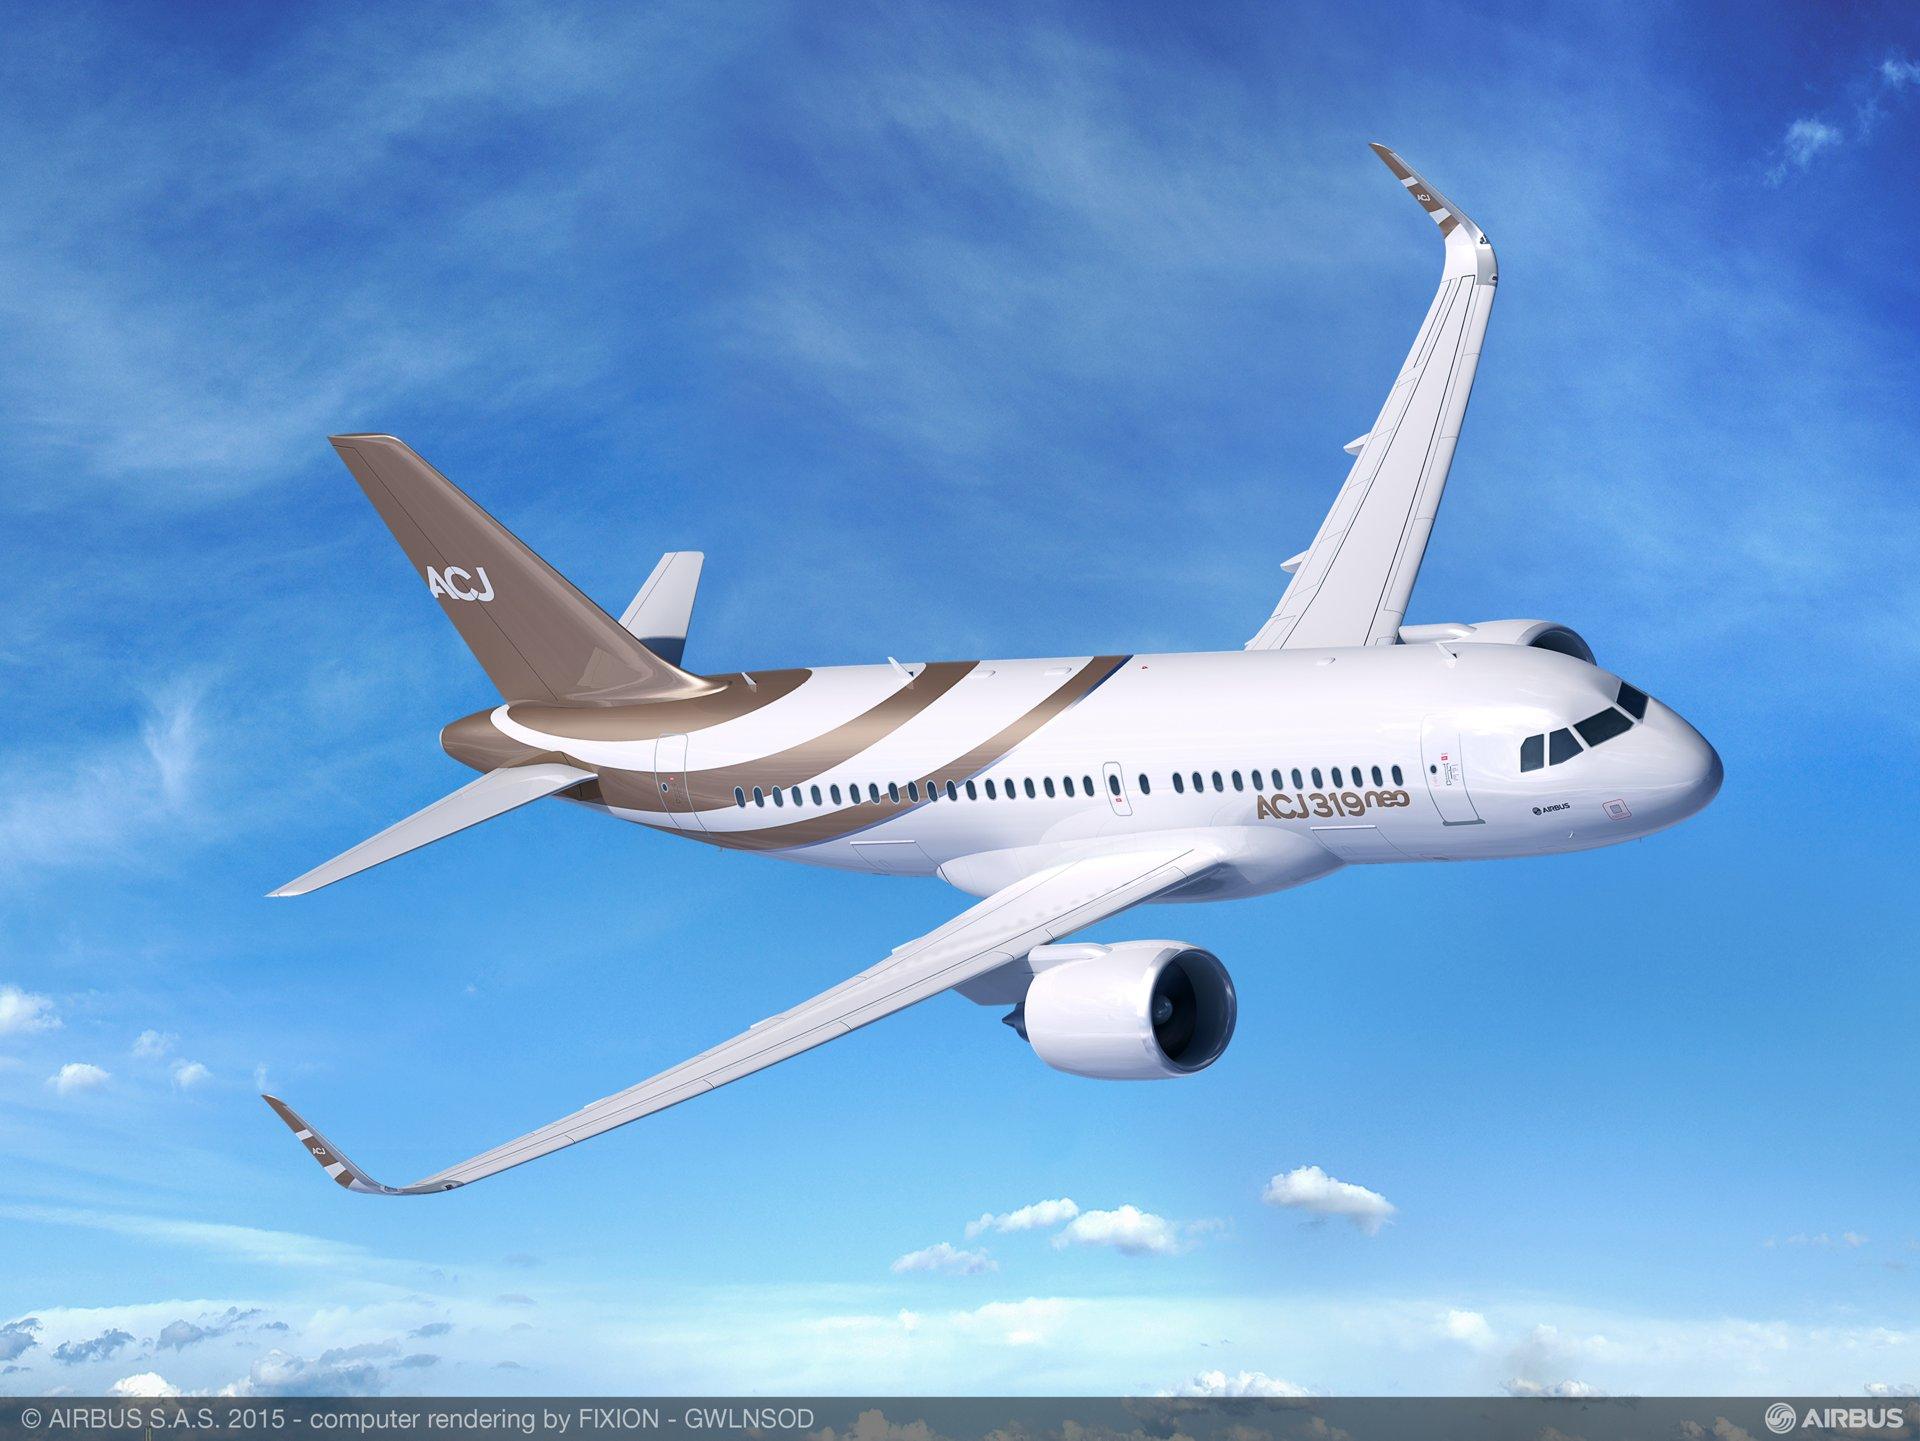 Airbus ACJ319neo